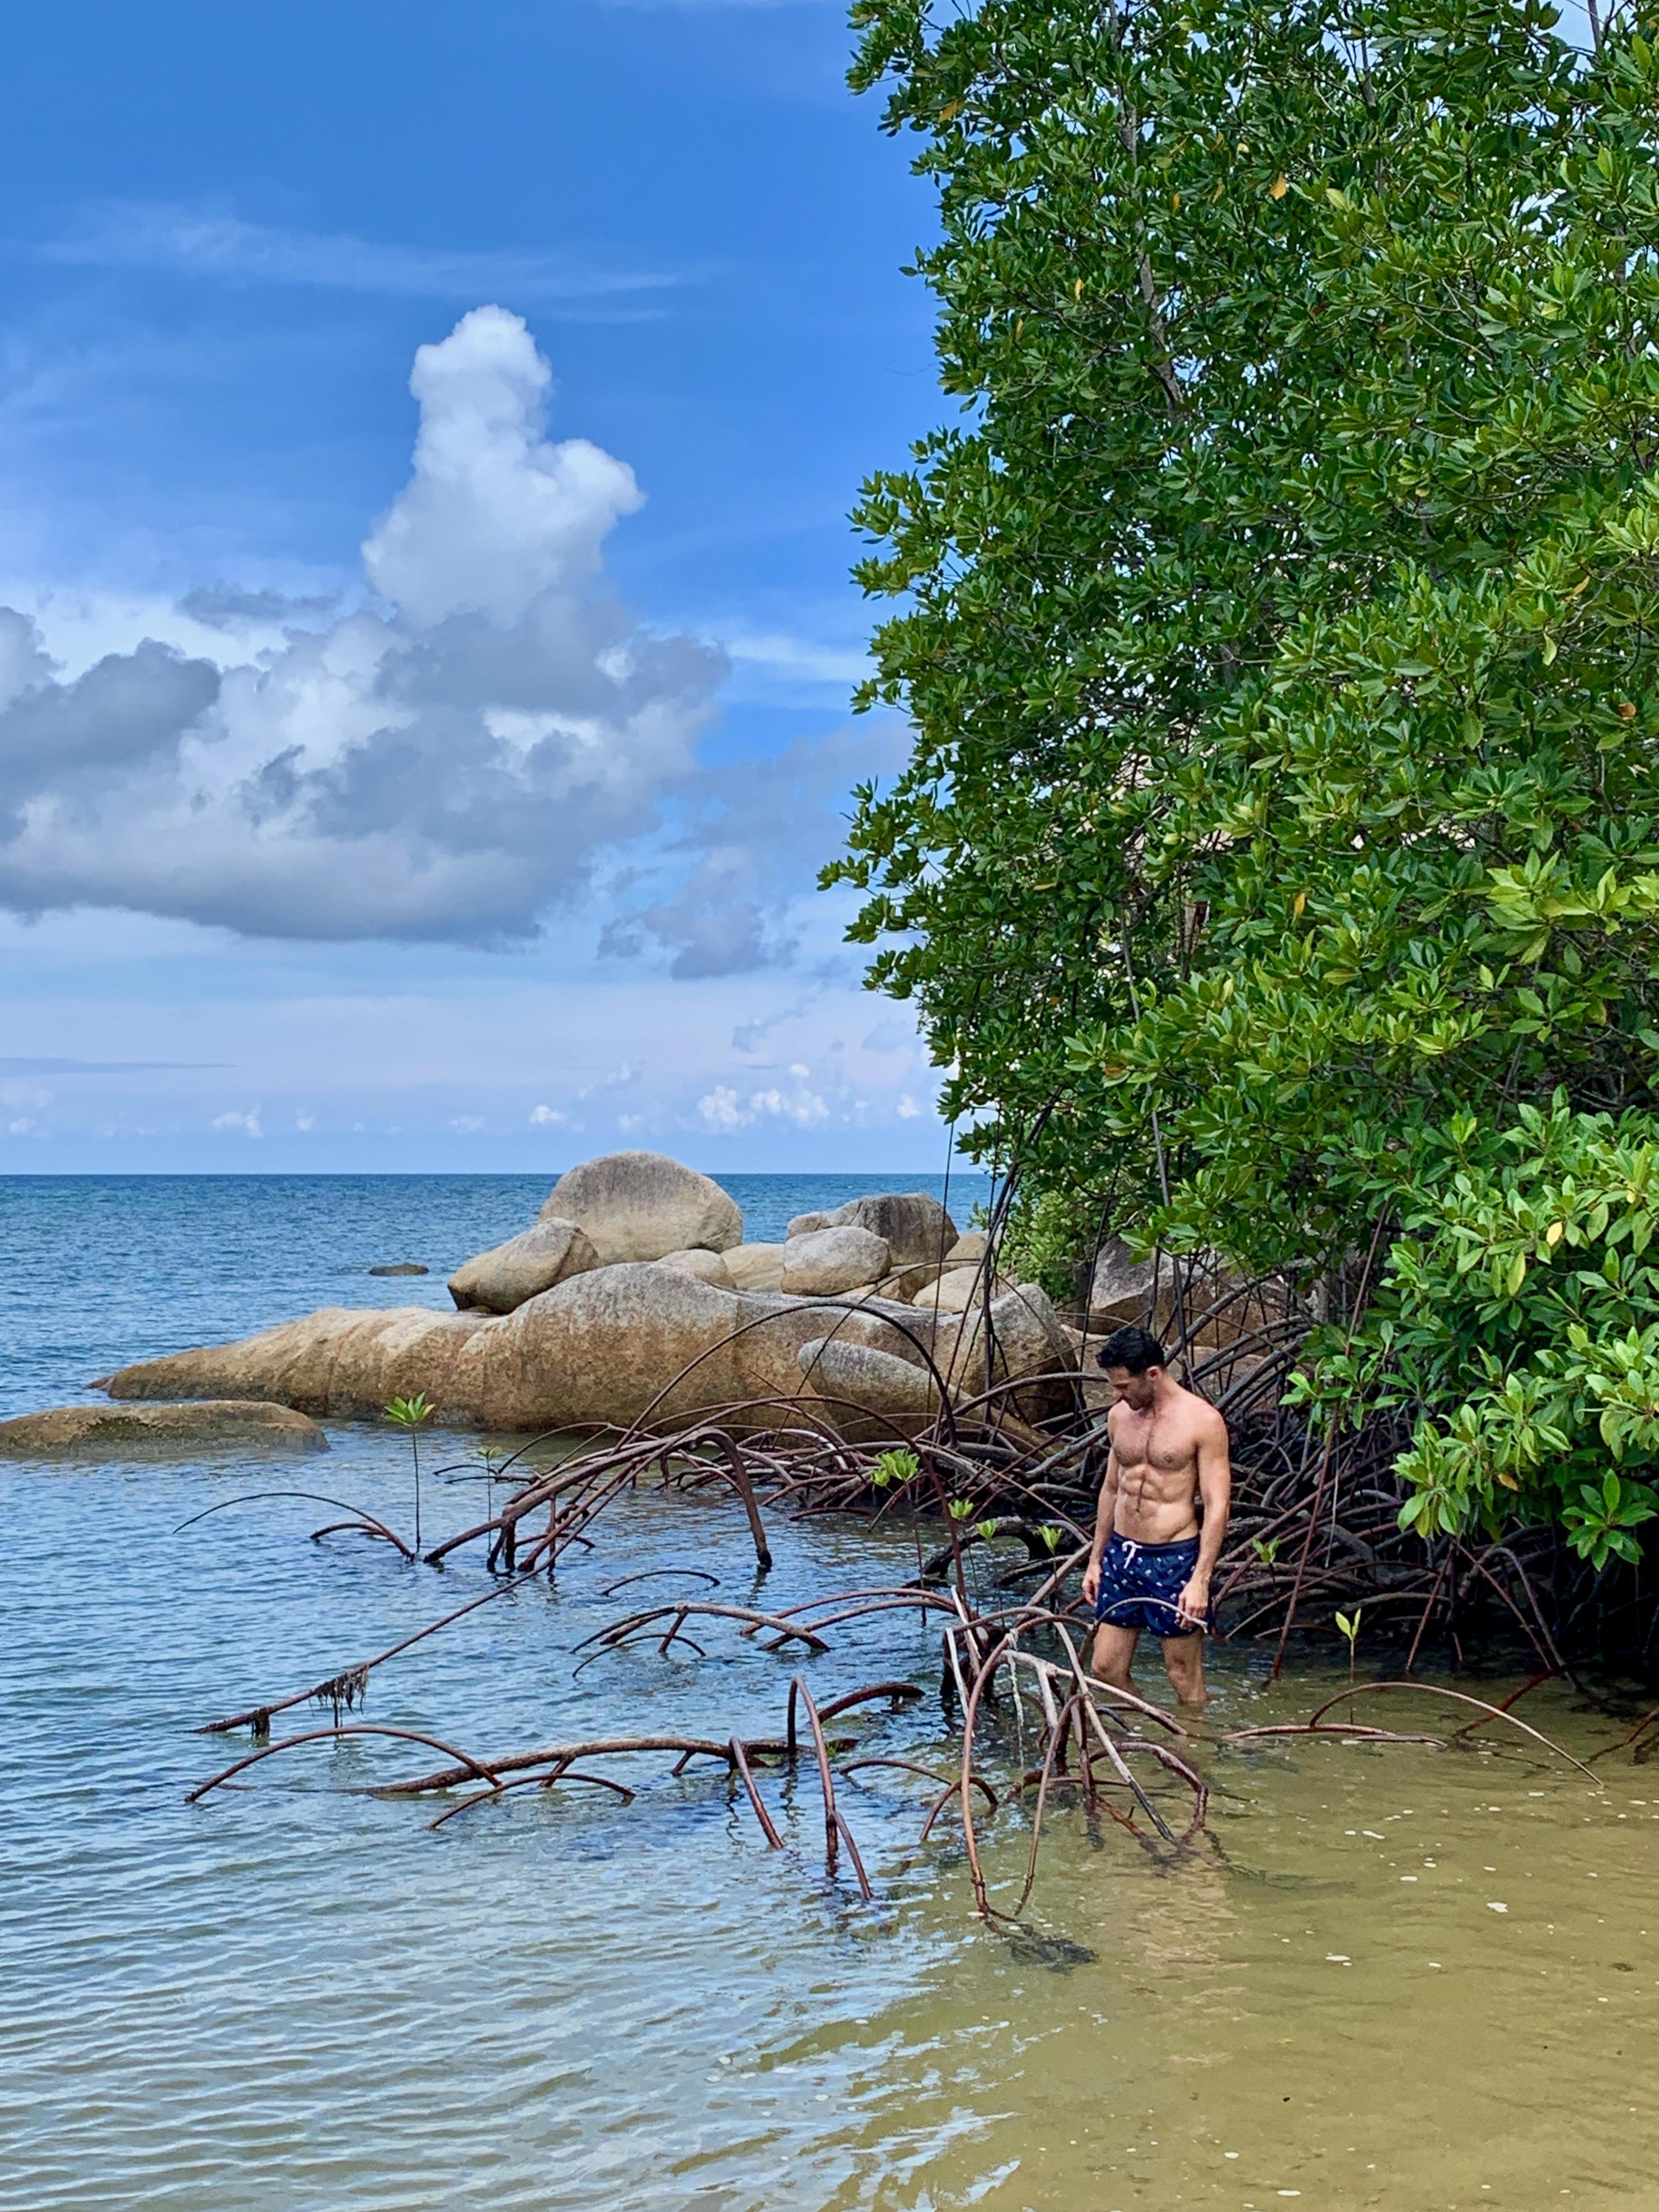 Cempedak Island Indonesia private island mangroves Justin Walter